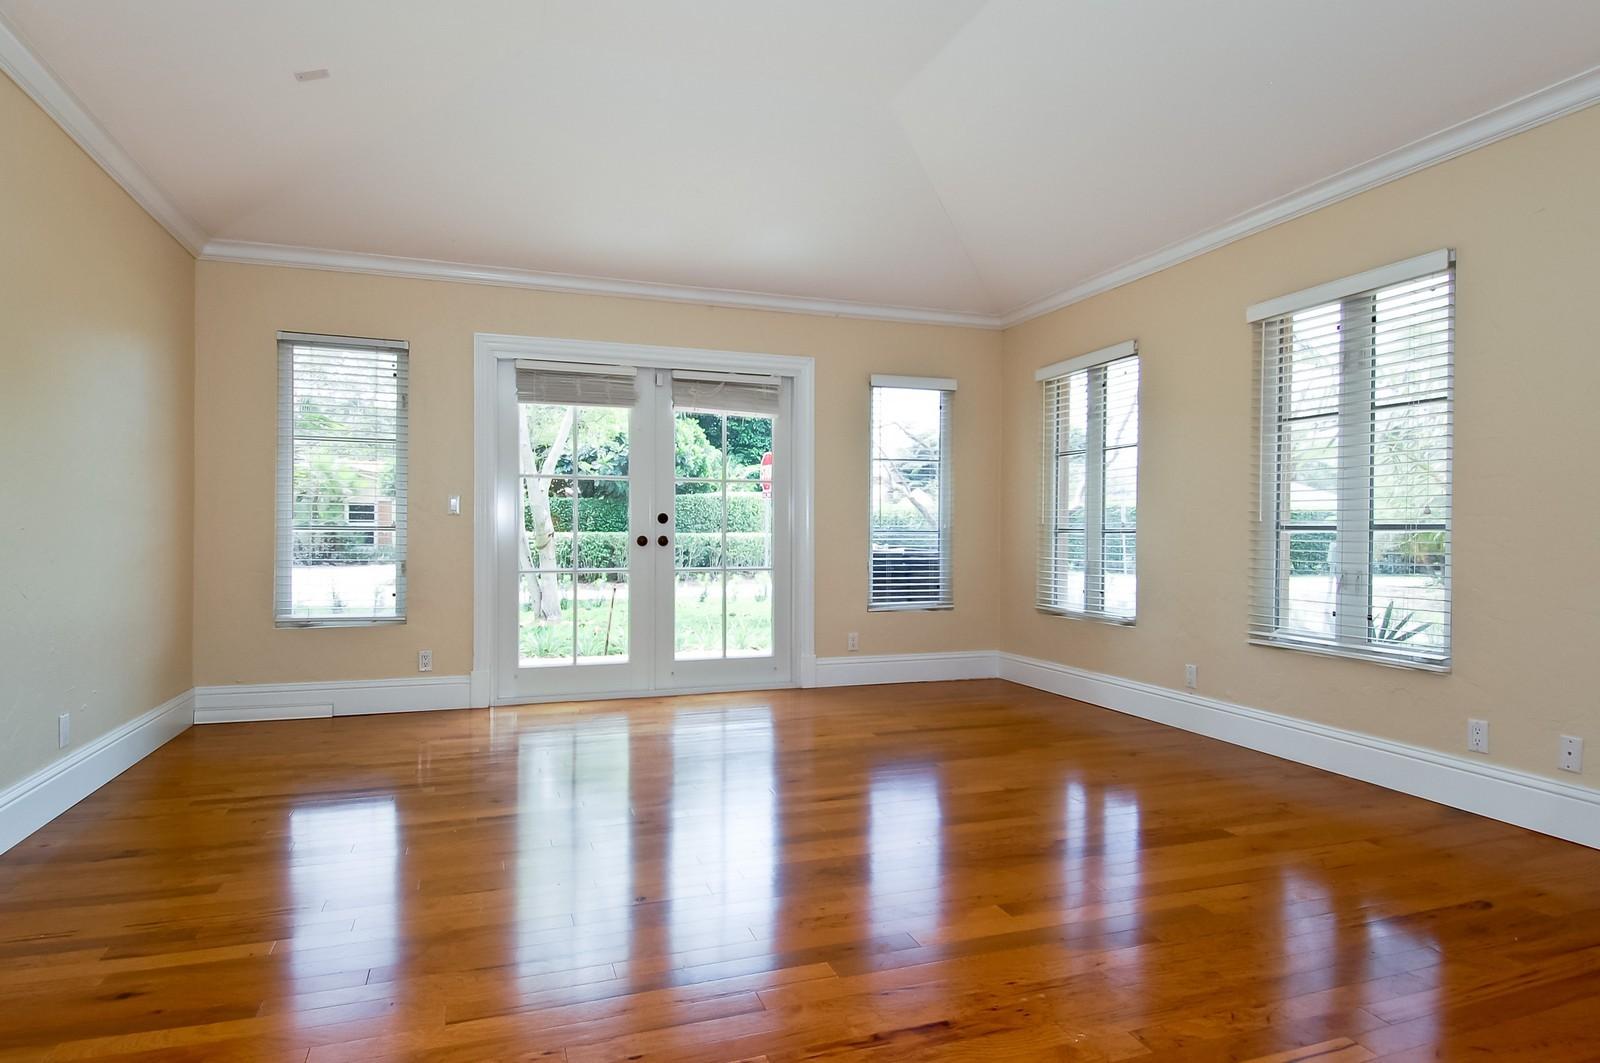 Real Estate Photography - 899 Azalea St, Boca Raton, FL, 33486 - Living Room